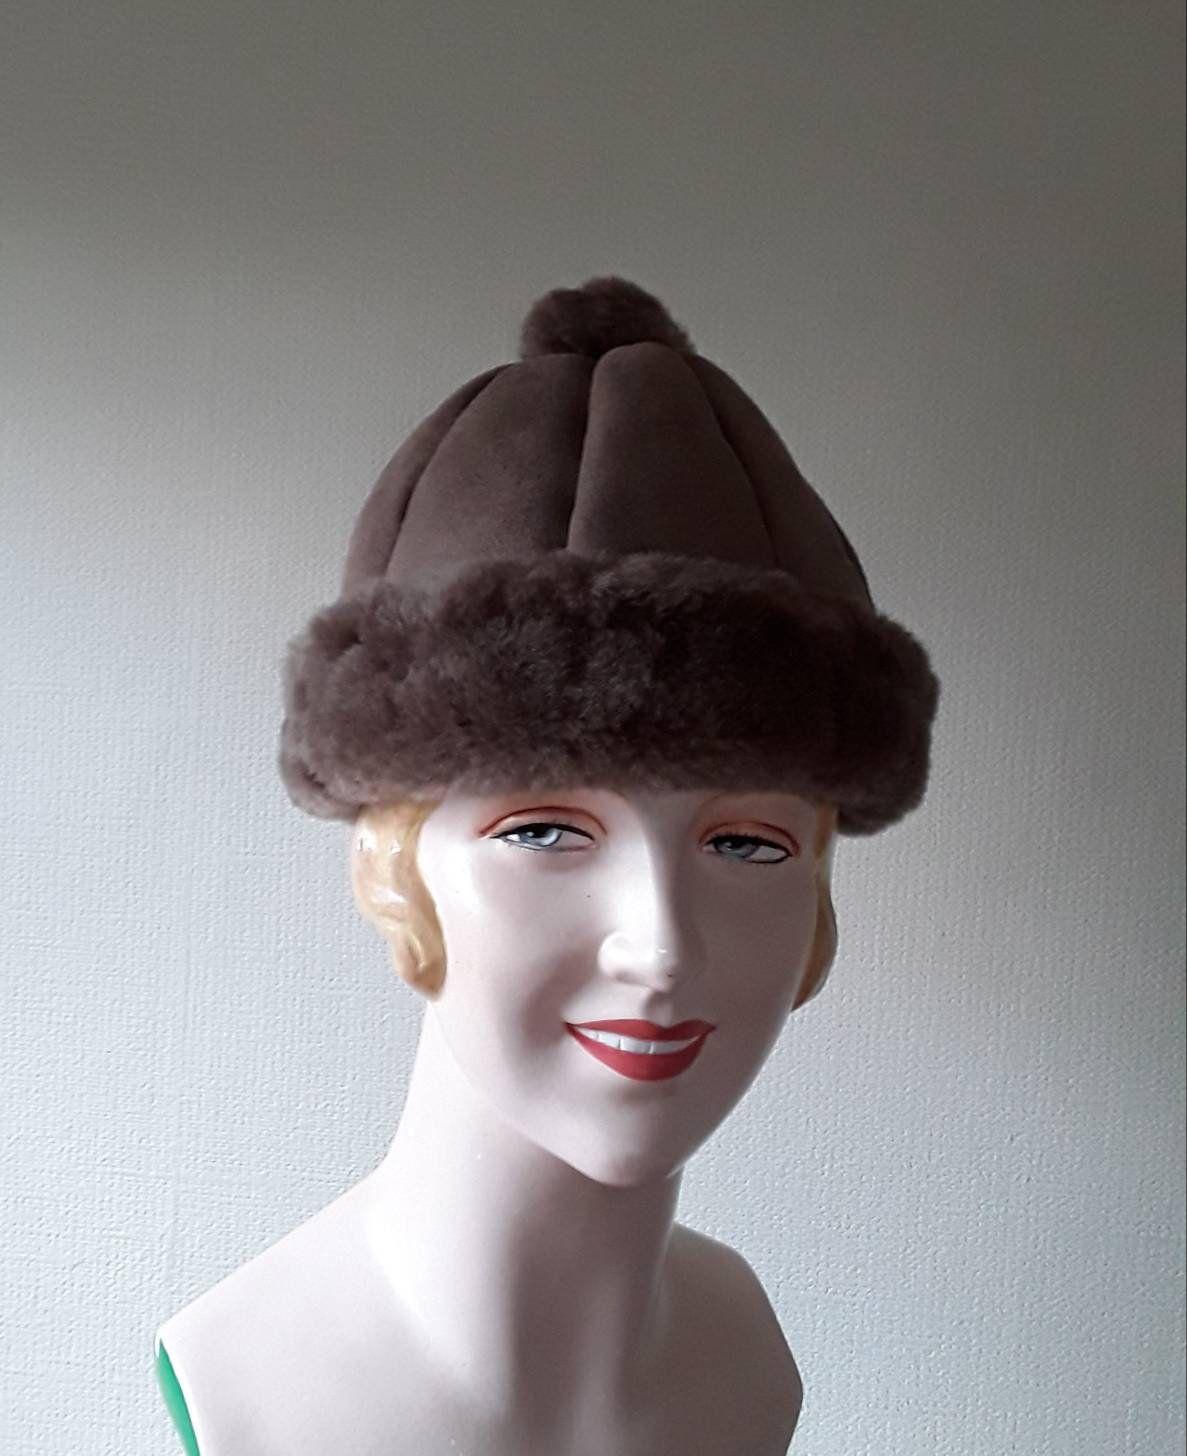 Sheepskin Hat Vintage Taupe Suede Hat Turn Back Rim And Pom Pom Detail Genuine Sheepskin Womens Hat Winter Hats Ma Hats Vintage Winter Hats For Women Suede Hat